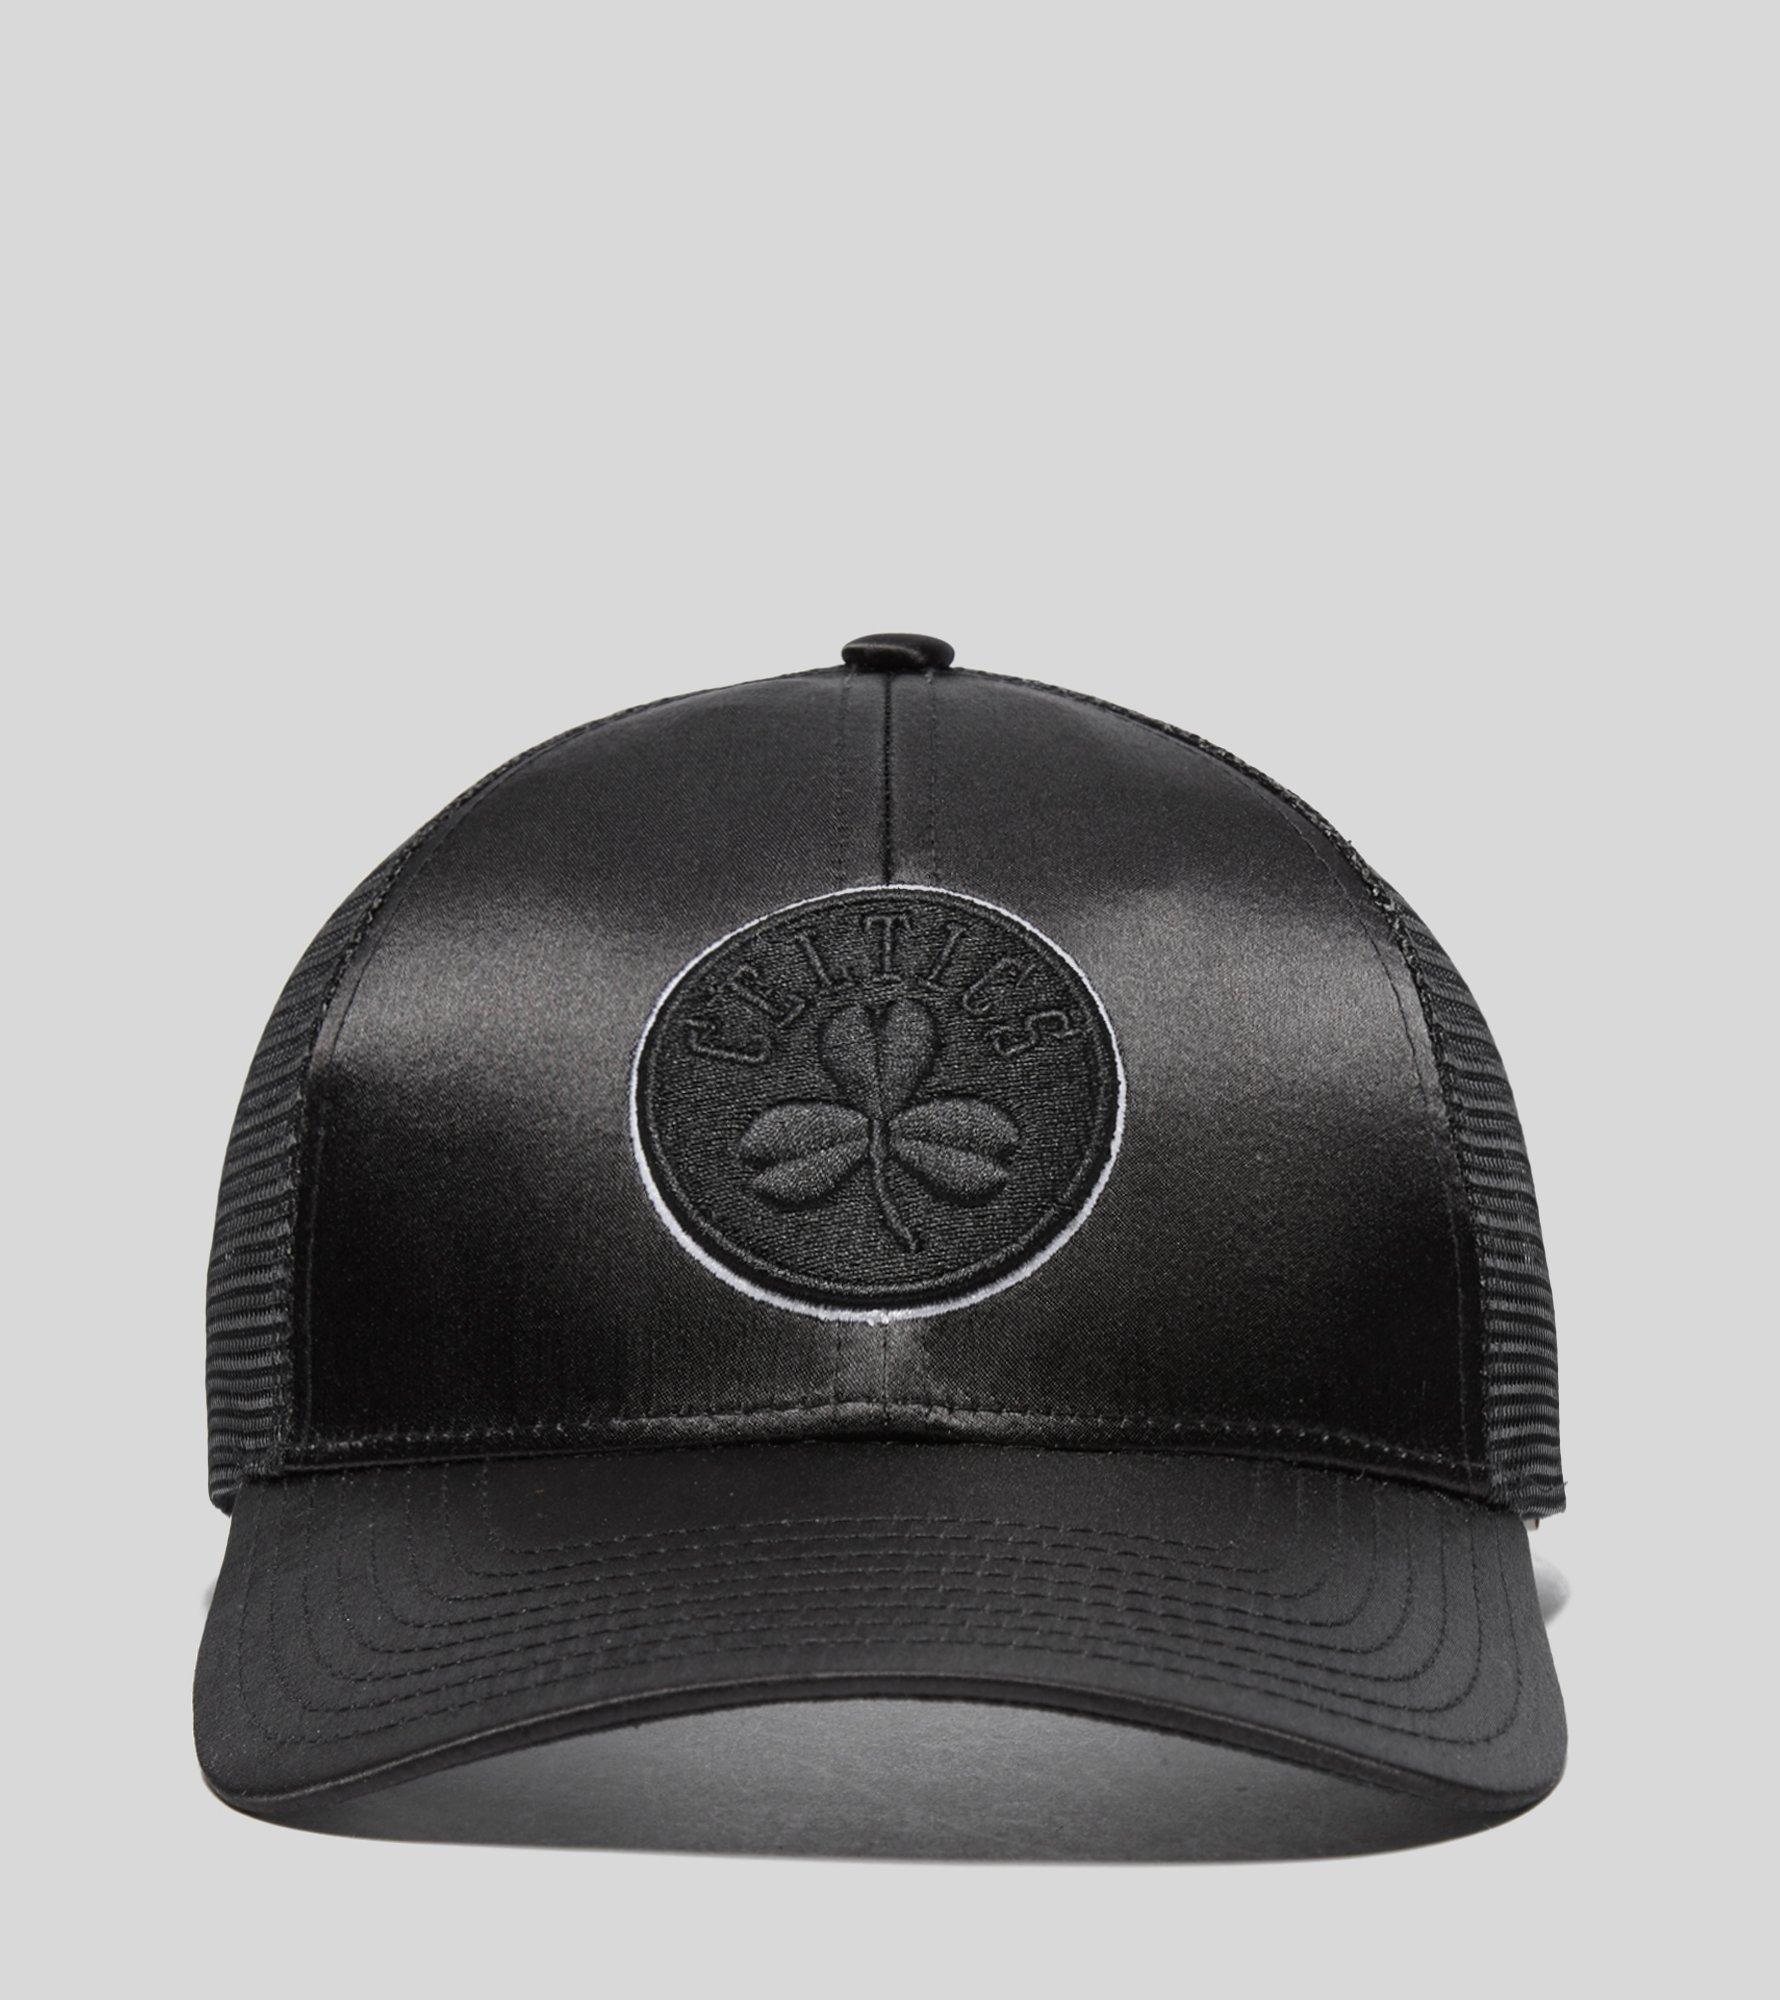 wholesale dealer 11764 8d0dc ... nba sharkstooth hook snapback cap d8eba bf591  top quality lyst  mitchell ness boston celtics satin trucker cap in black for men 9a5f9 da420